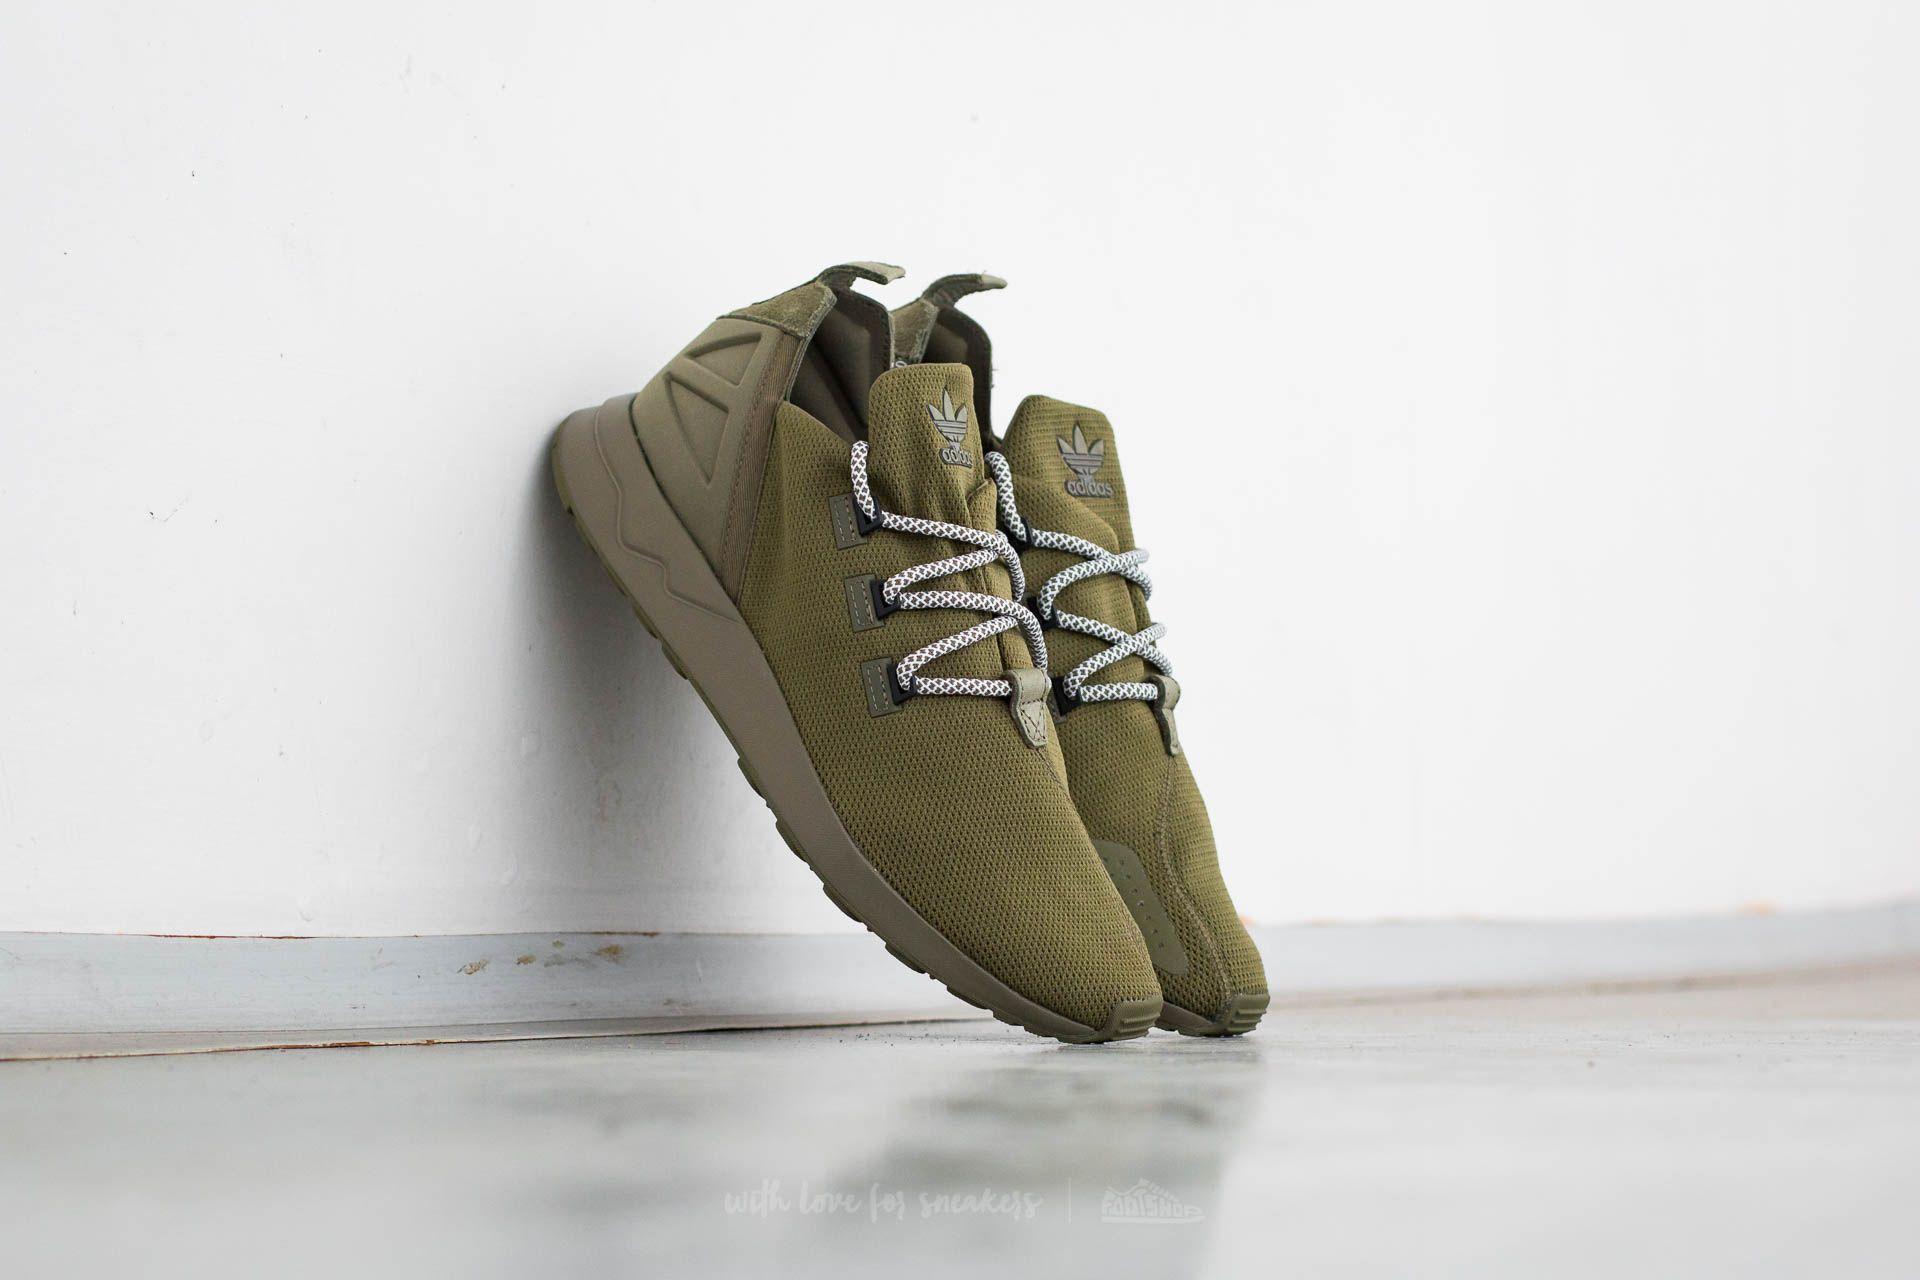 dc5fb3f4e ... adv x adidas nmd shoes sneaker sneakerhead  adidas zx flux adv x adidas  nmd shoes sneaker sneakerhead  adidas zx flux olive cargo vintage white  s79087